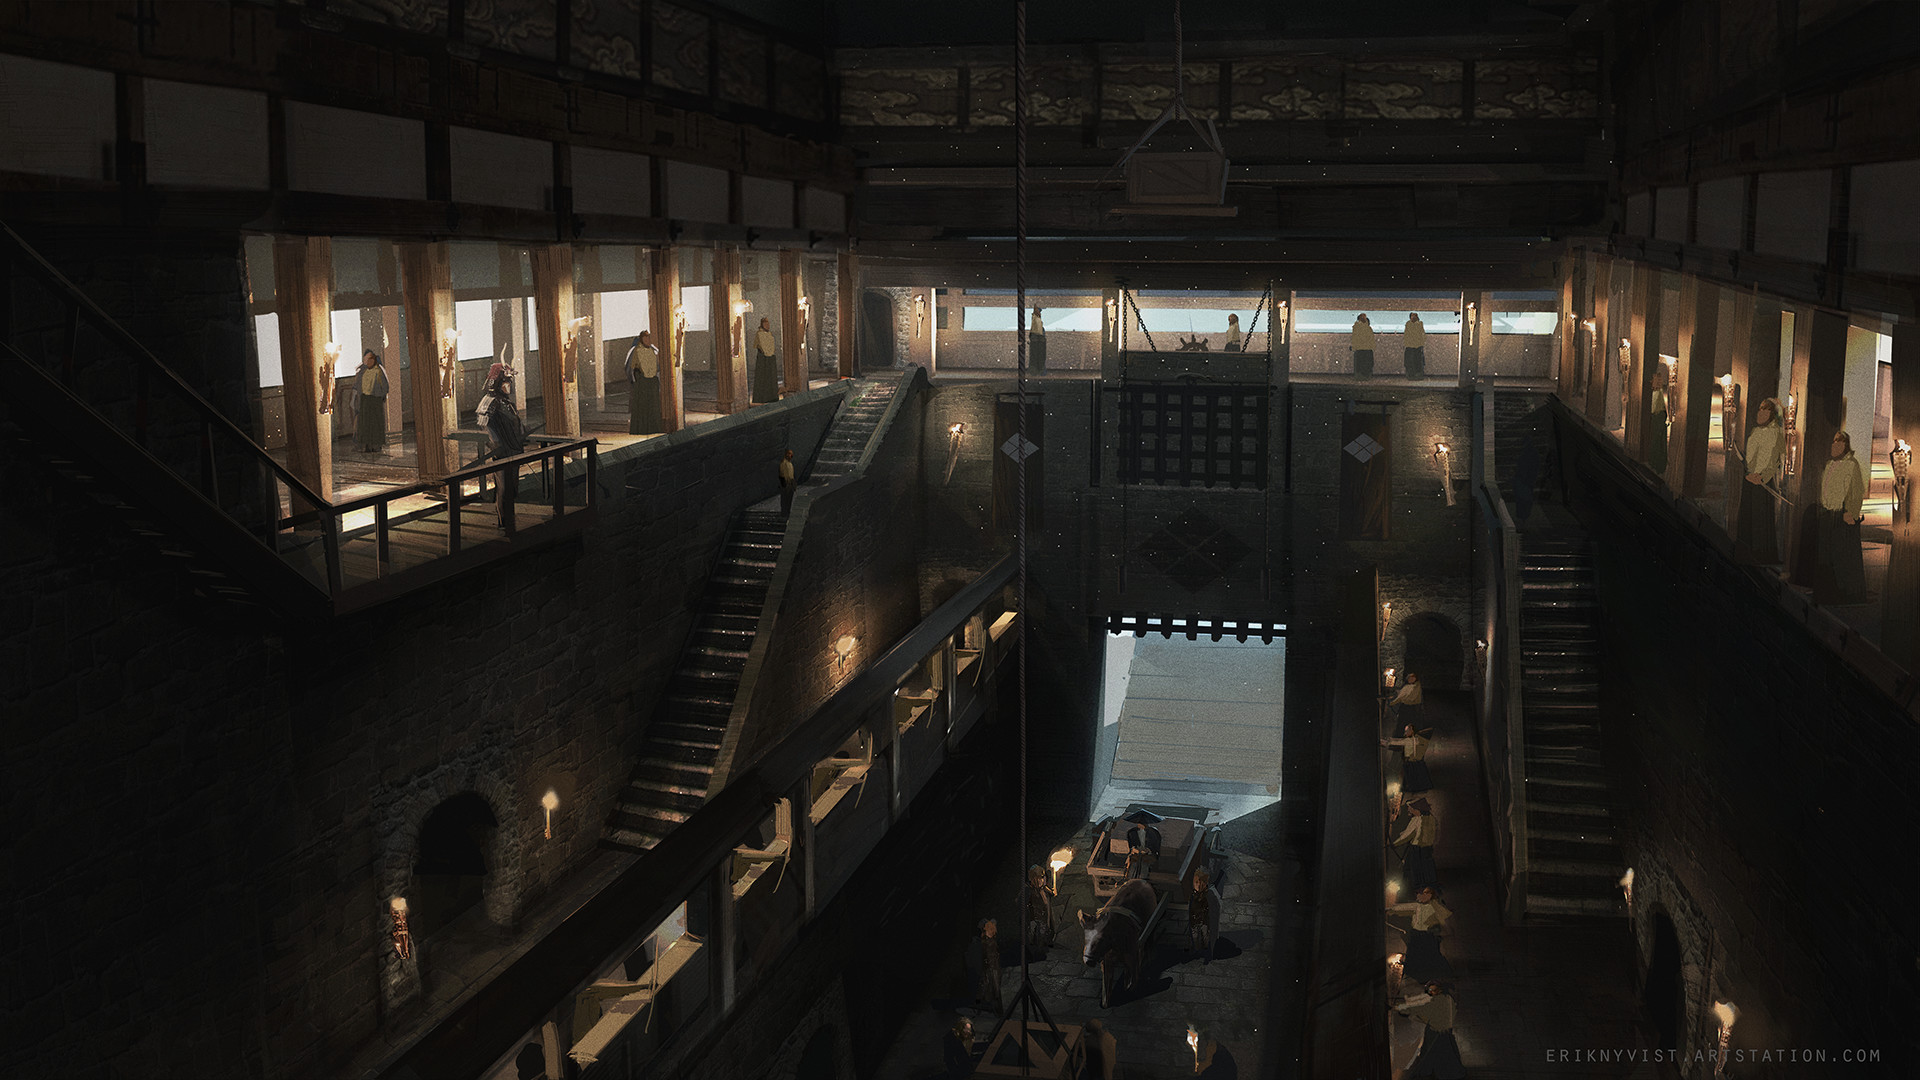 Erik nykvist castle interior 01